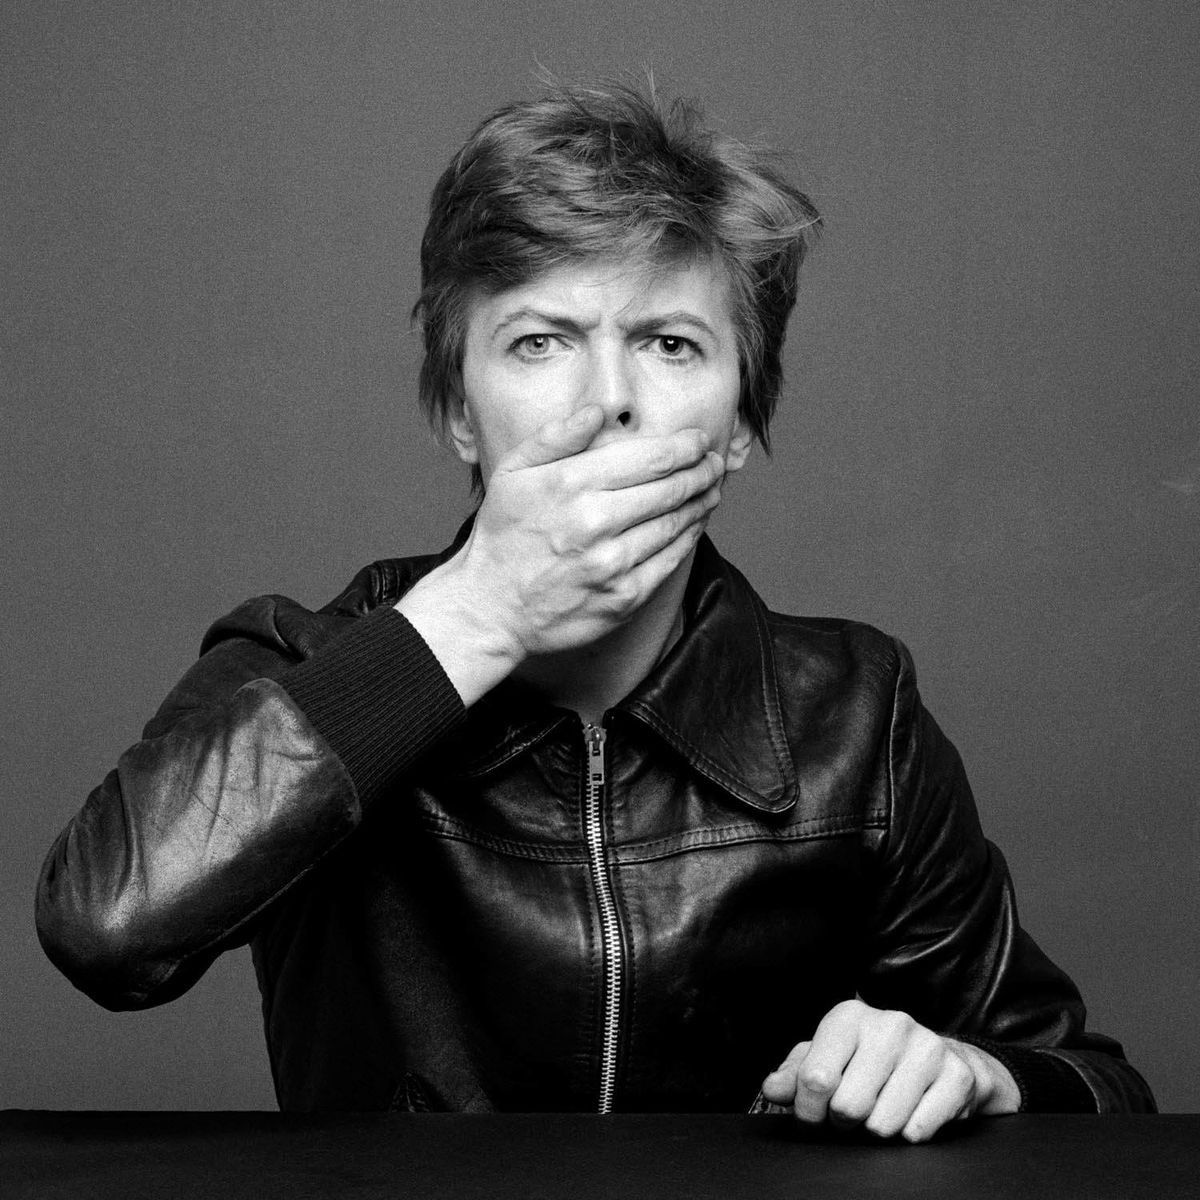 Pin By Caitlyn None Ya On David Bowie David Bowie David Bowie Starman Bowie